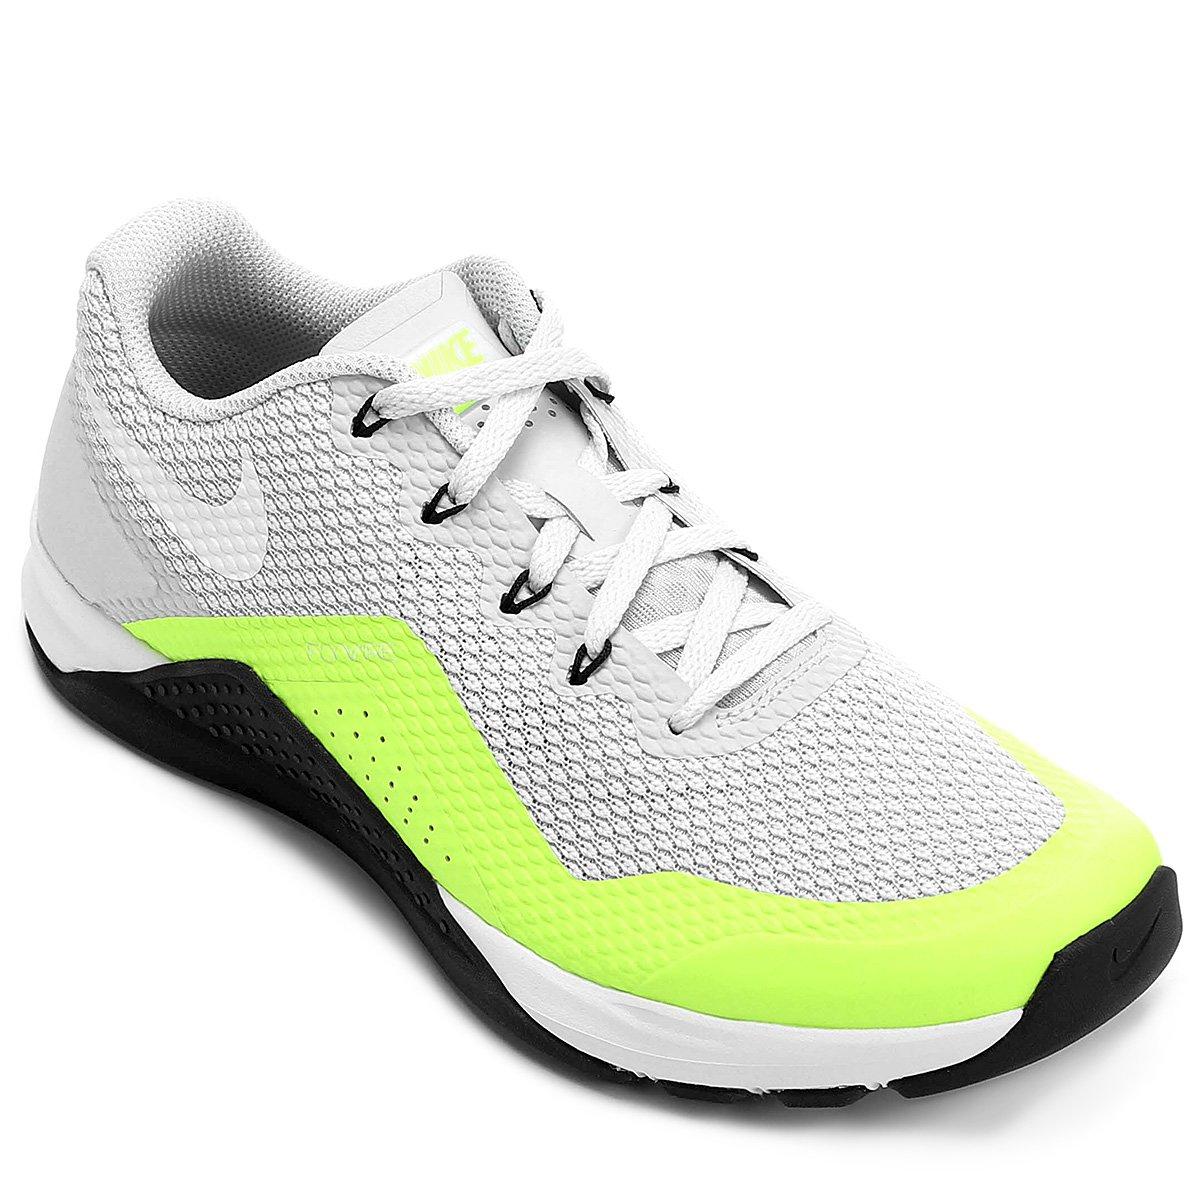 7173311a662 Tênis Nike Metcon Repper DSX Masculino - Compre Agora